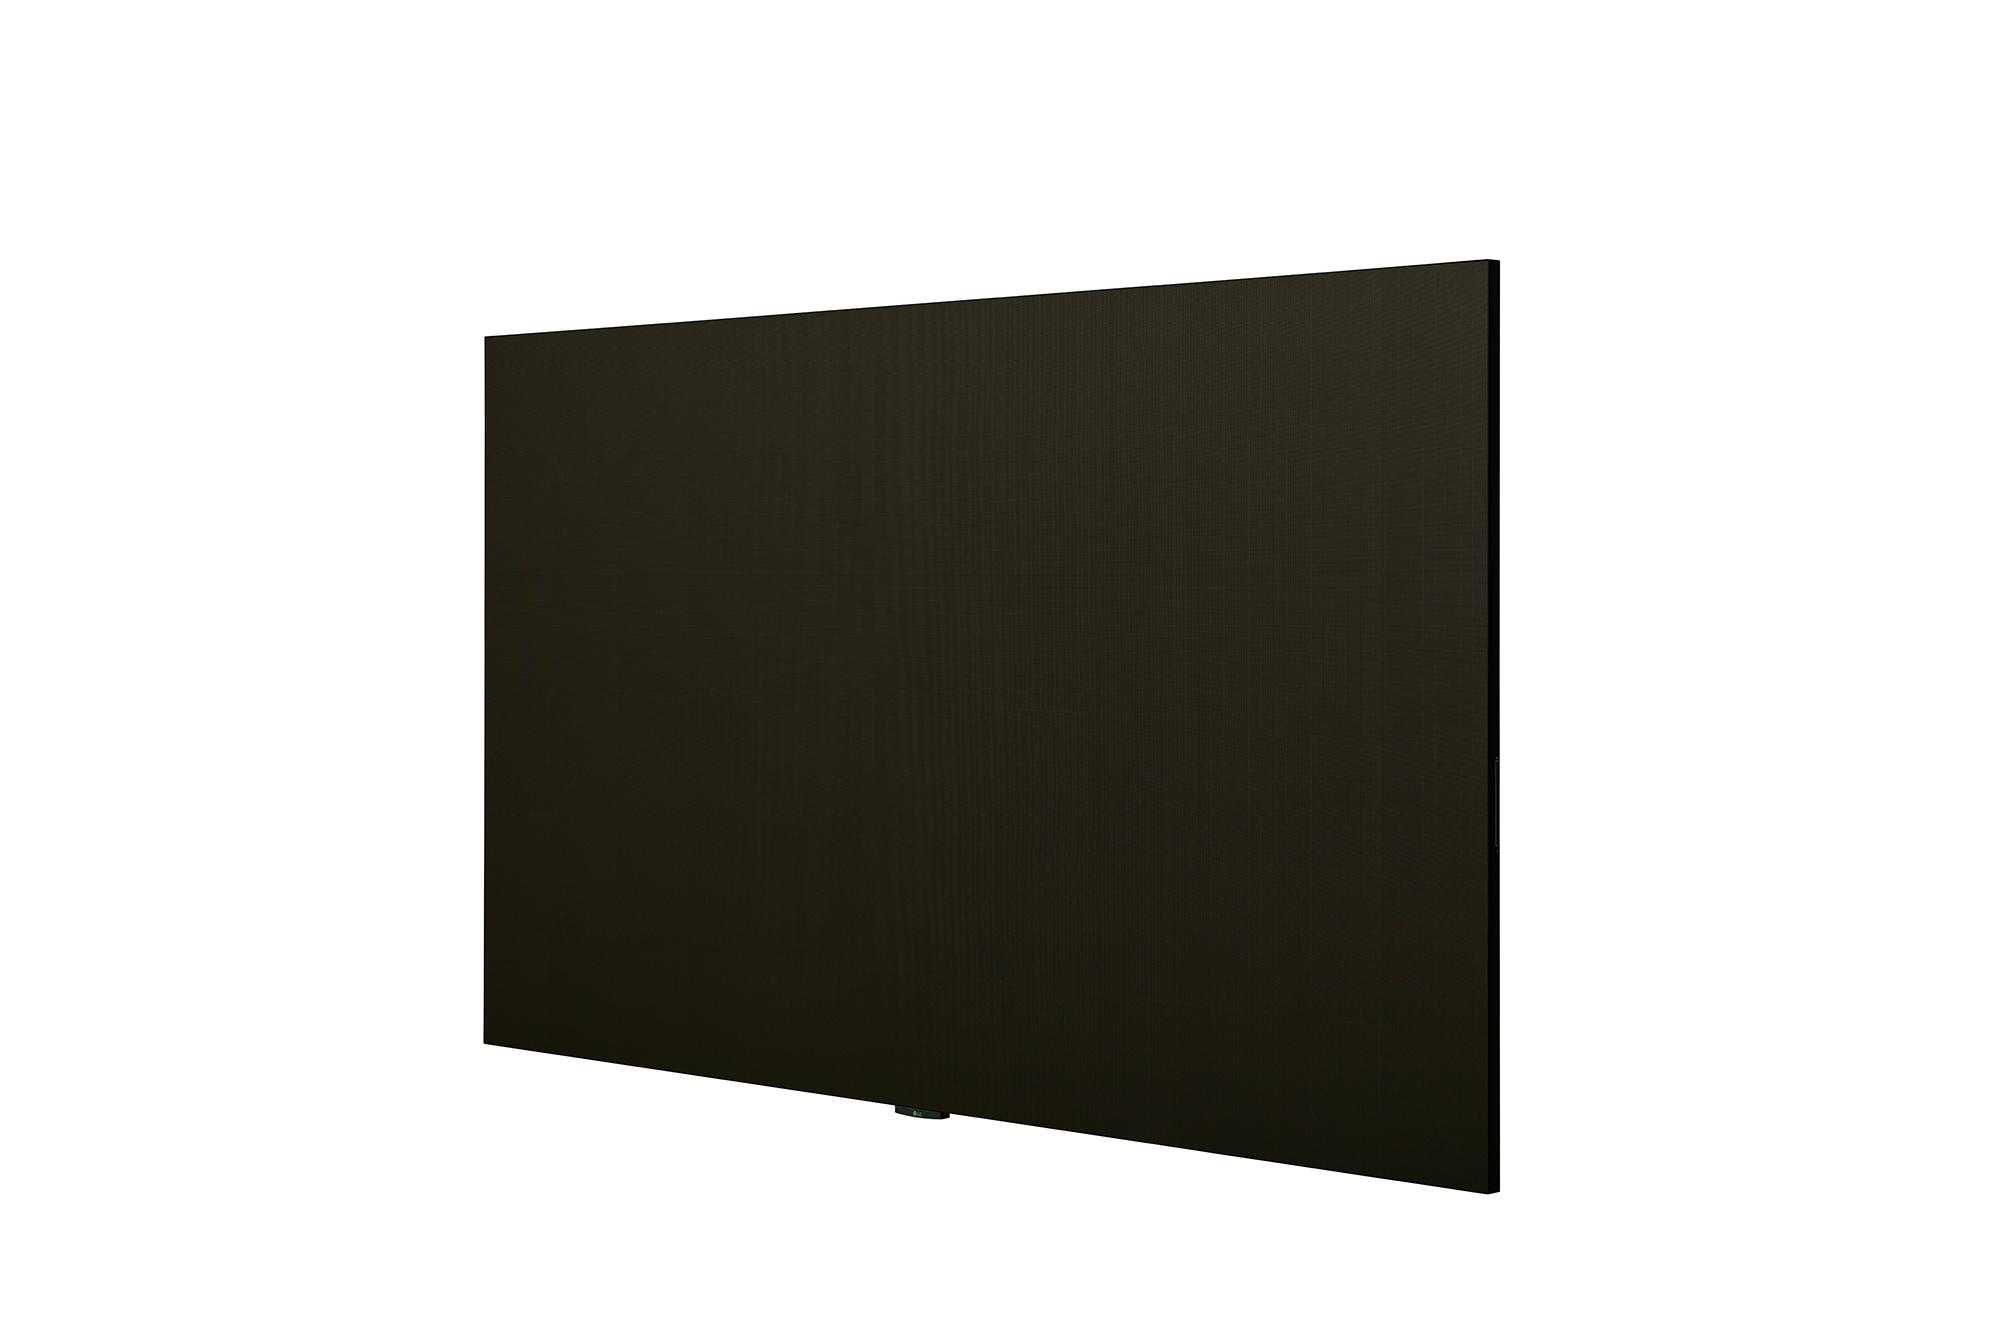 LED Signage LAEC015, -45 degree side view